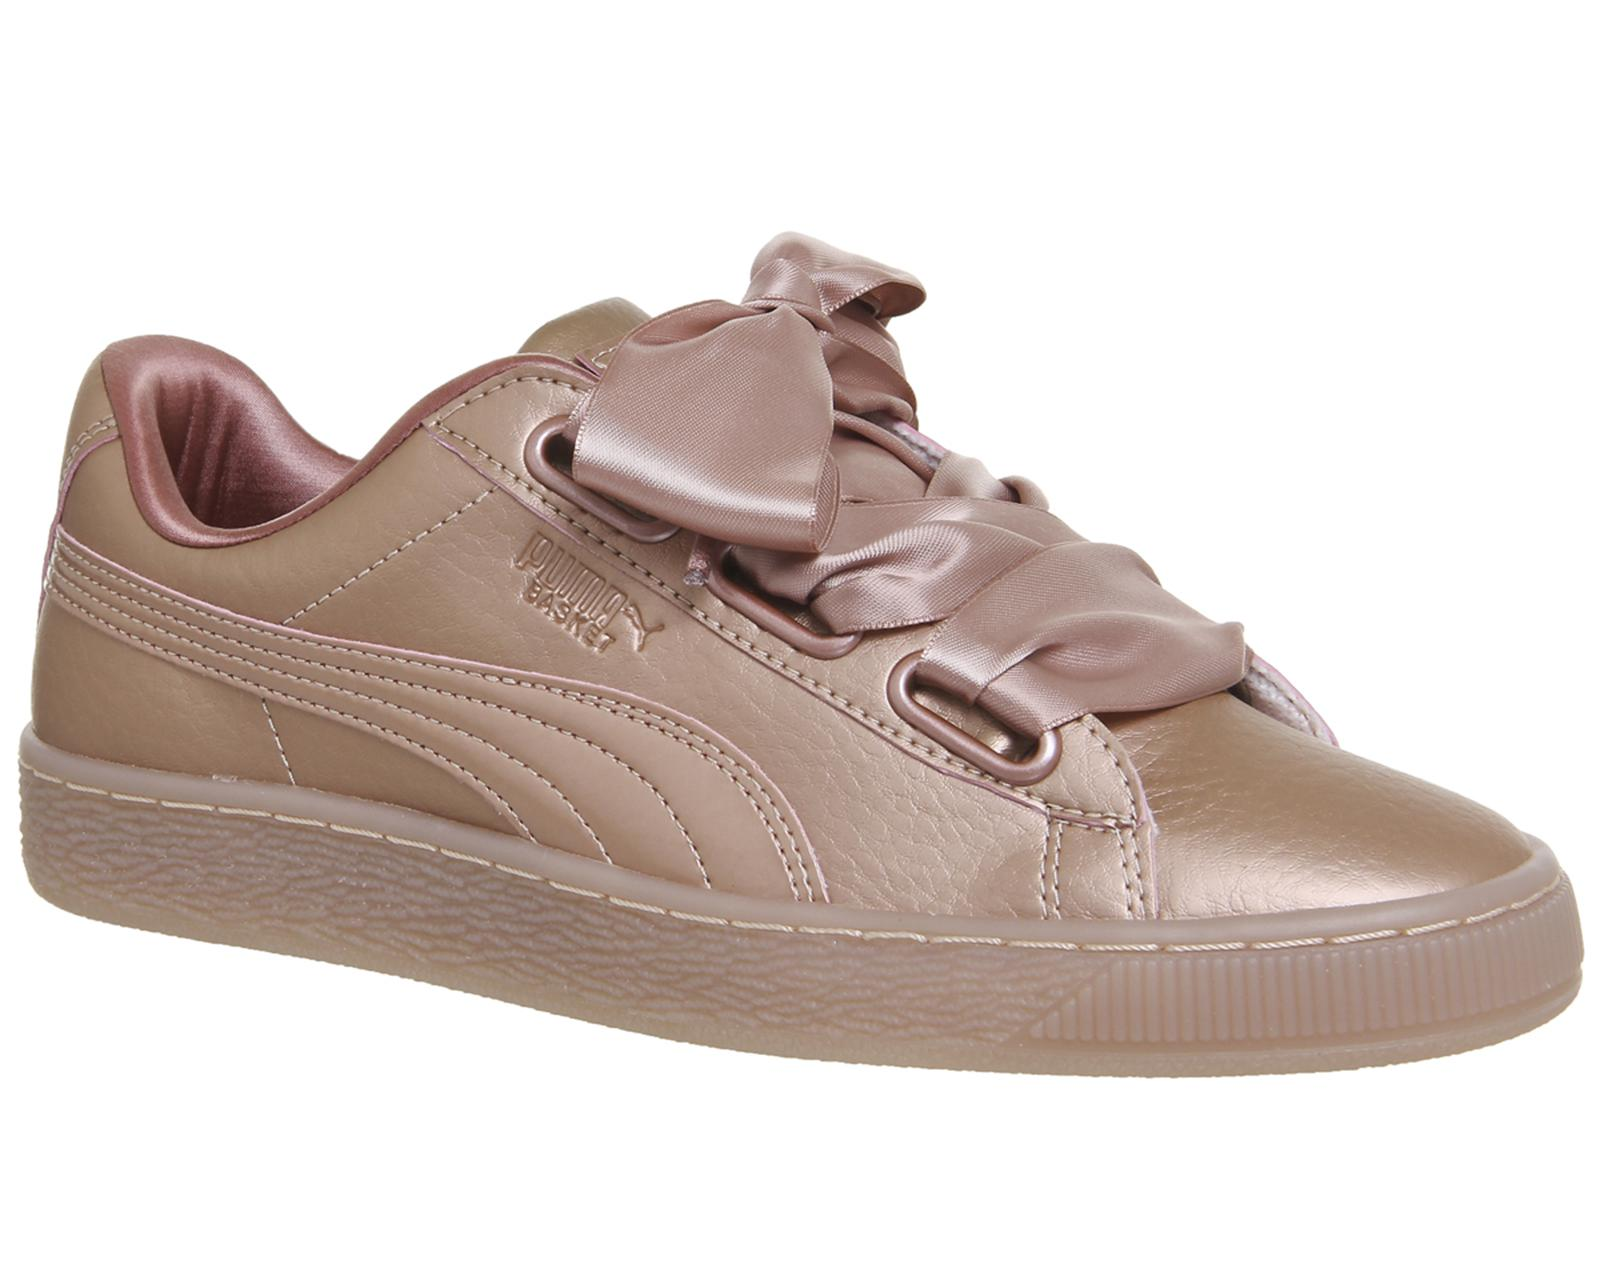 ff4c7666a38123 Puma Basket Heart Trainers - Lyst